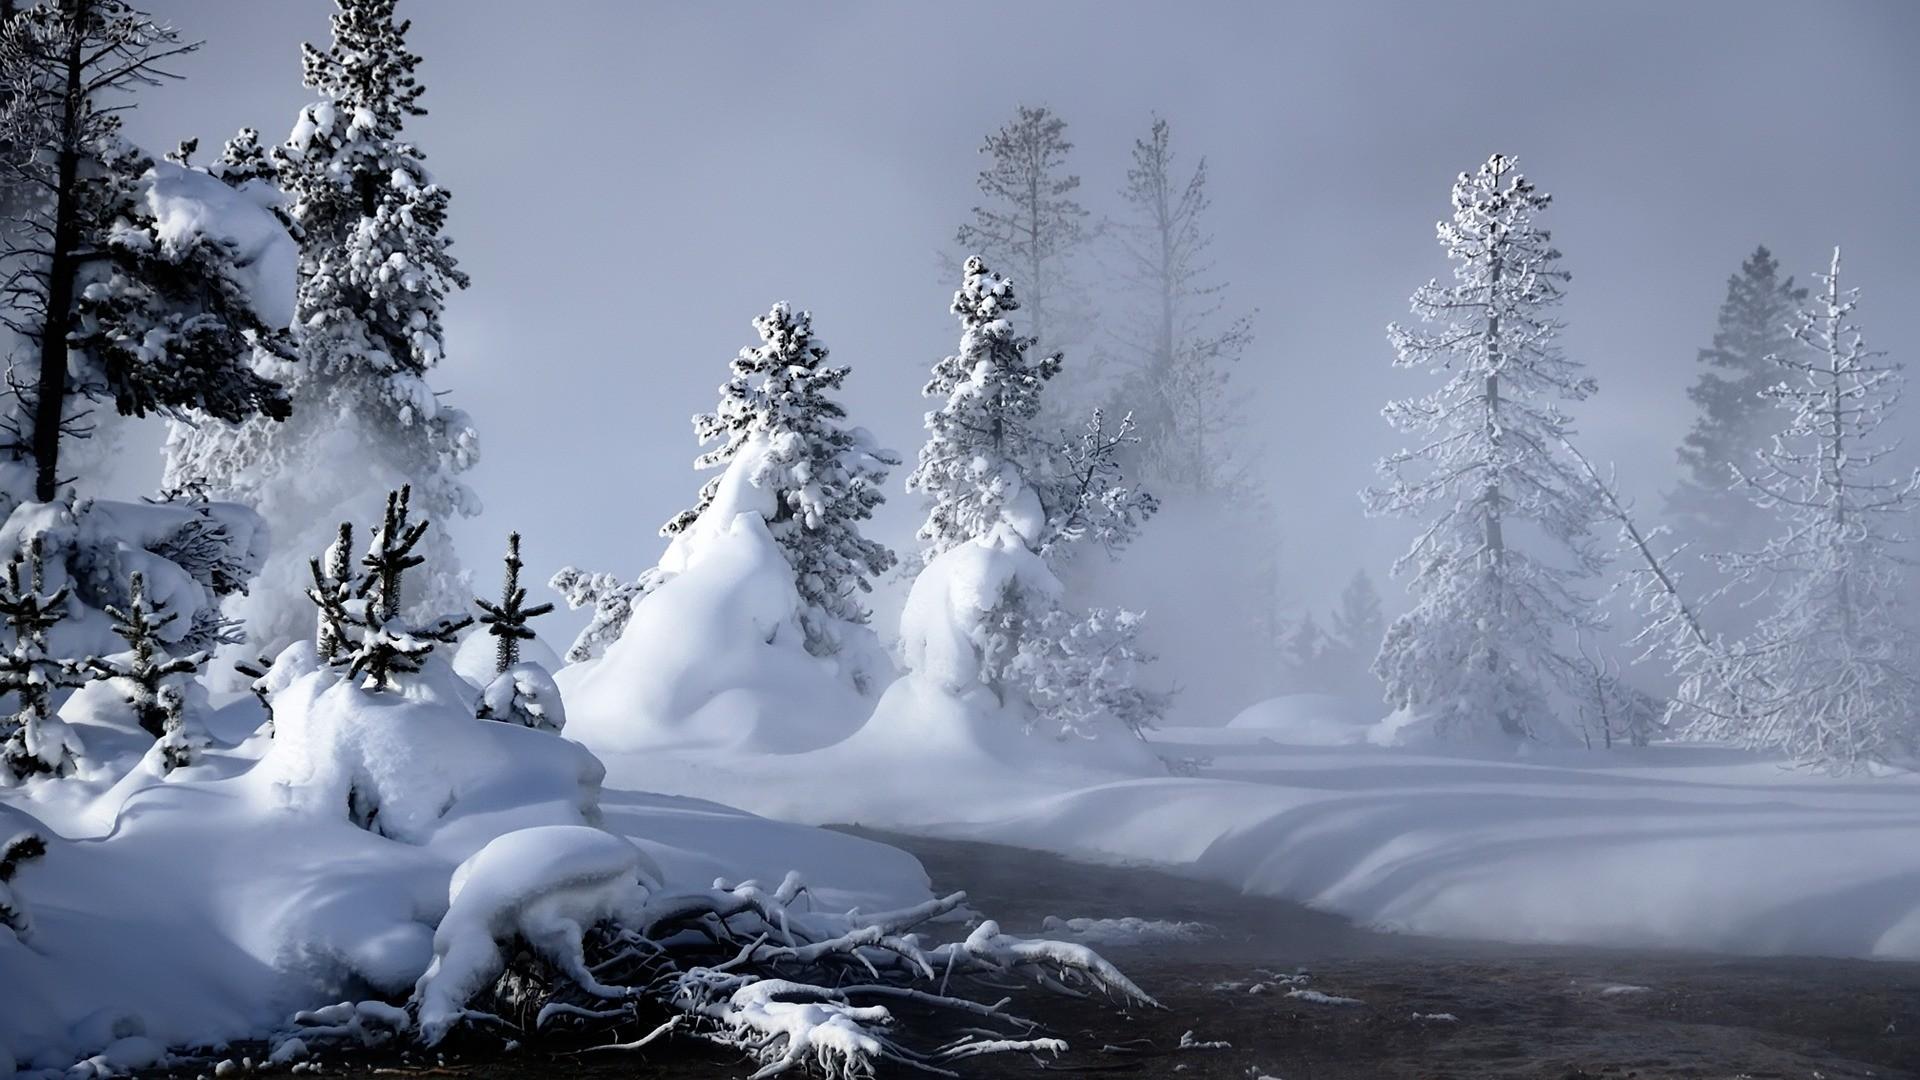 Mystic Winter Wallpaper Winter Nature Wallpapers